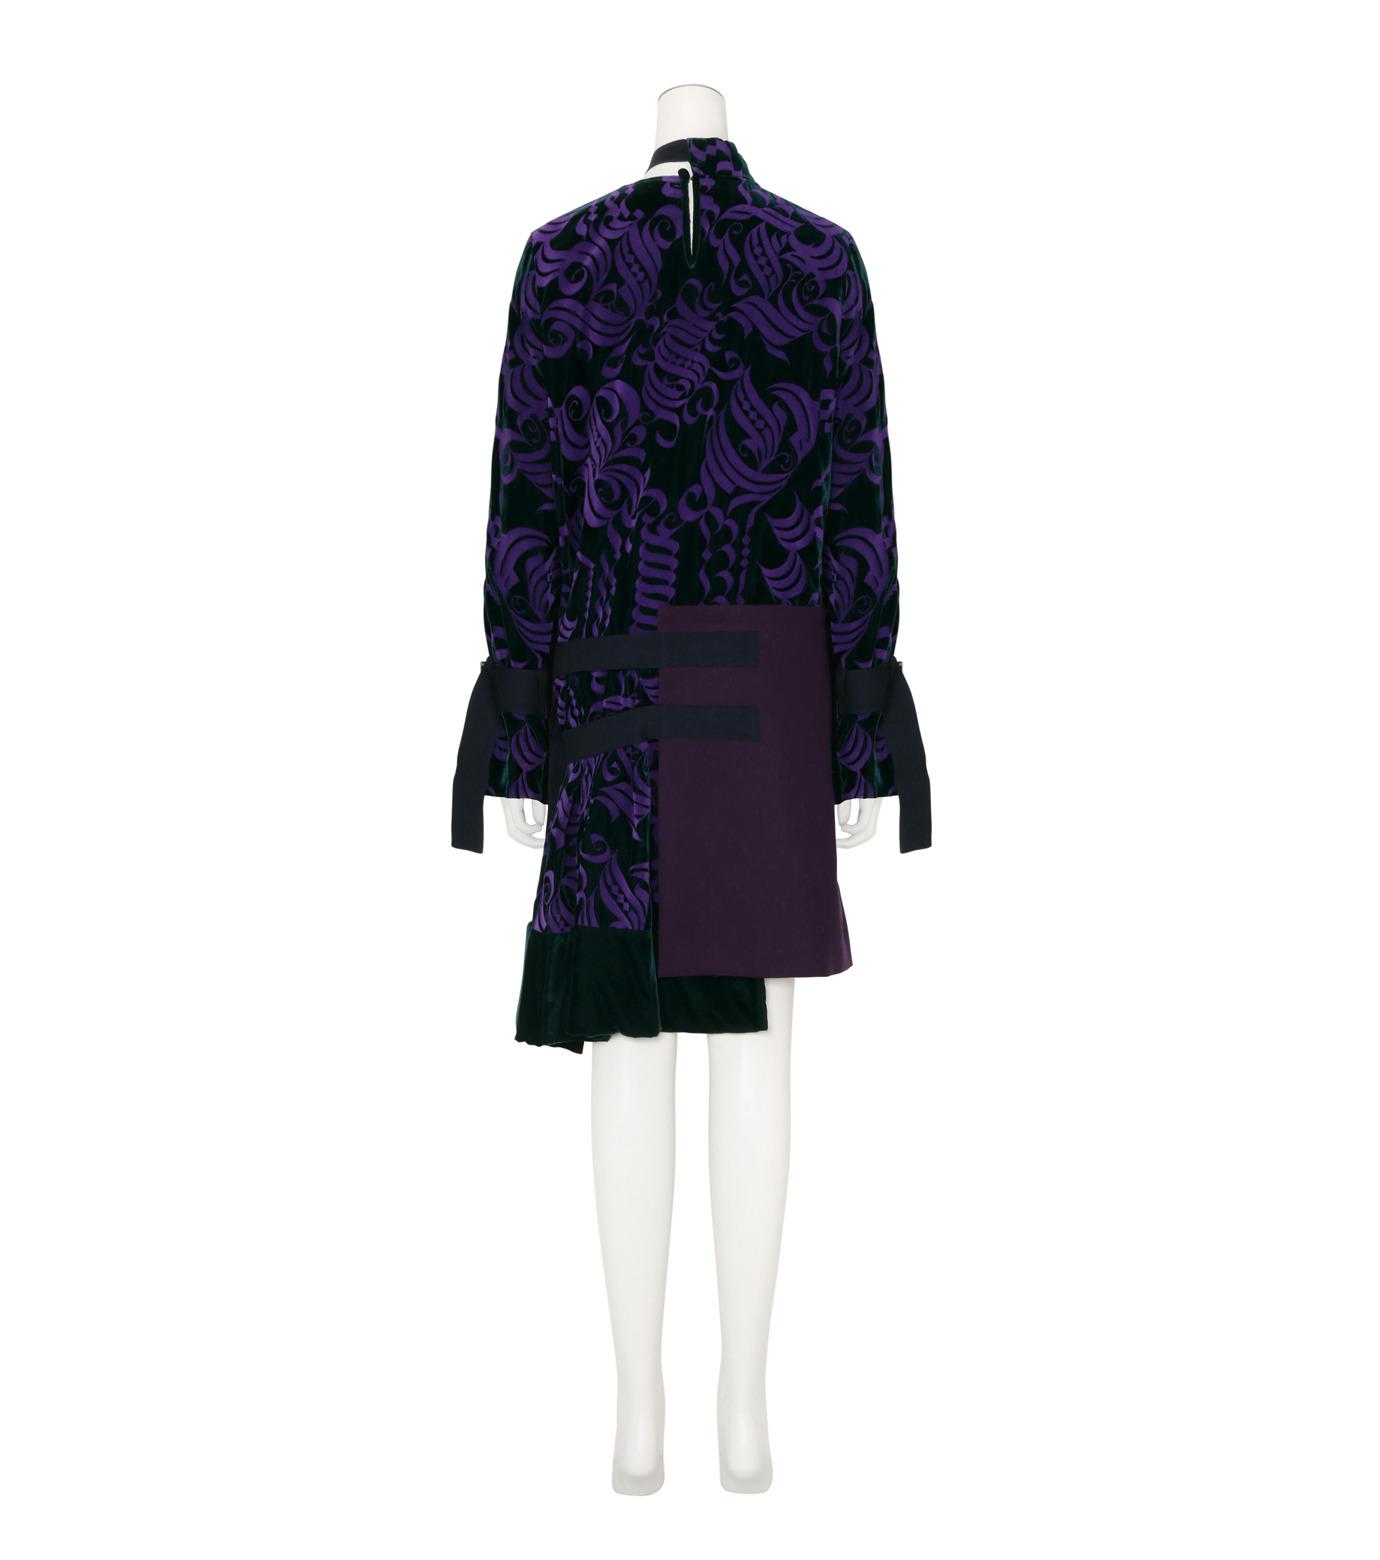 Sacai(サカイ)のVelvet Dress-PURPLE(ワンピース/one piece)-16-02877-82 拡大詳細画像2